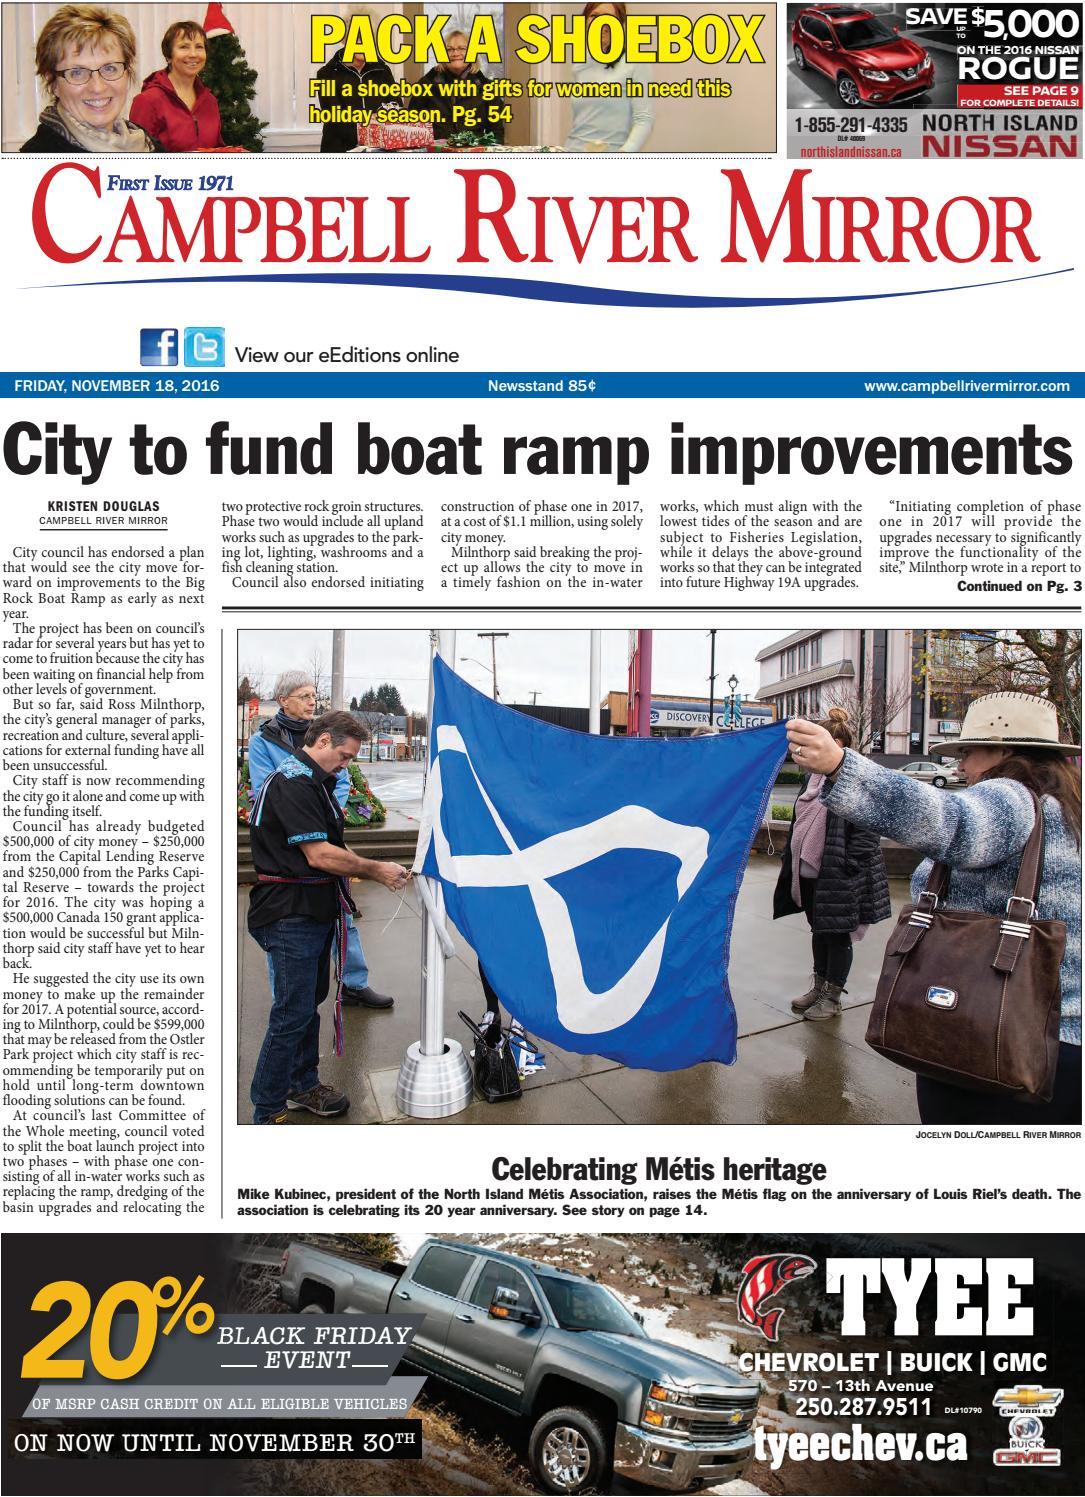 bc3ad4bdd4 Campbell River Mirror, November 18, 2016 by Black Press Media Group - issuu